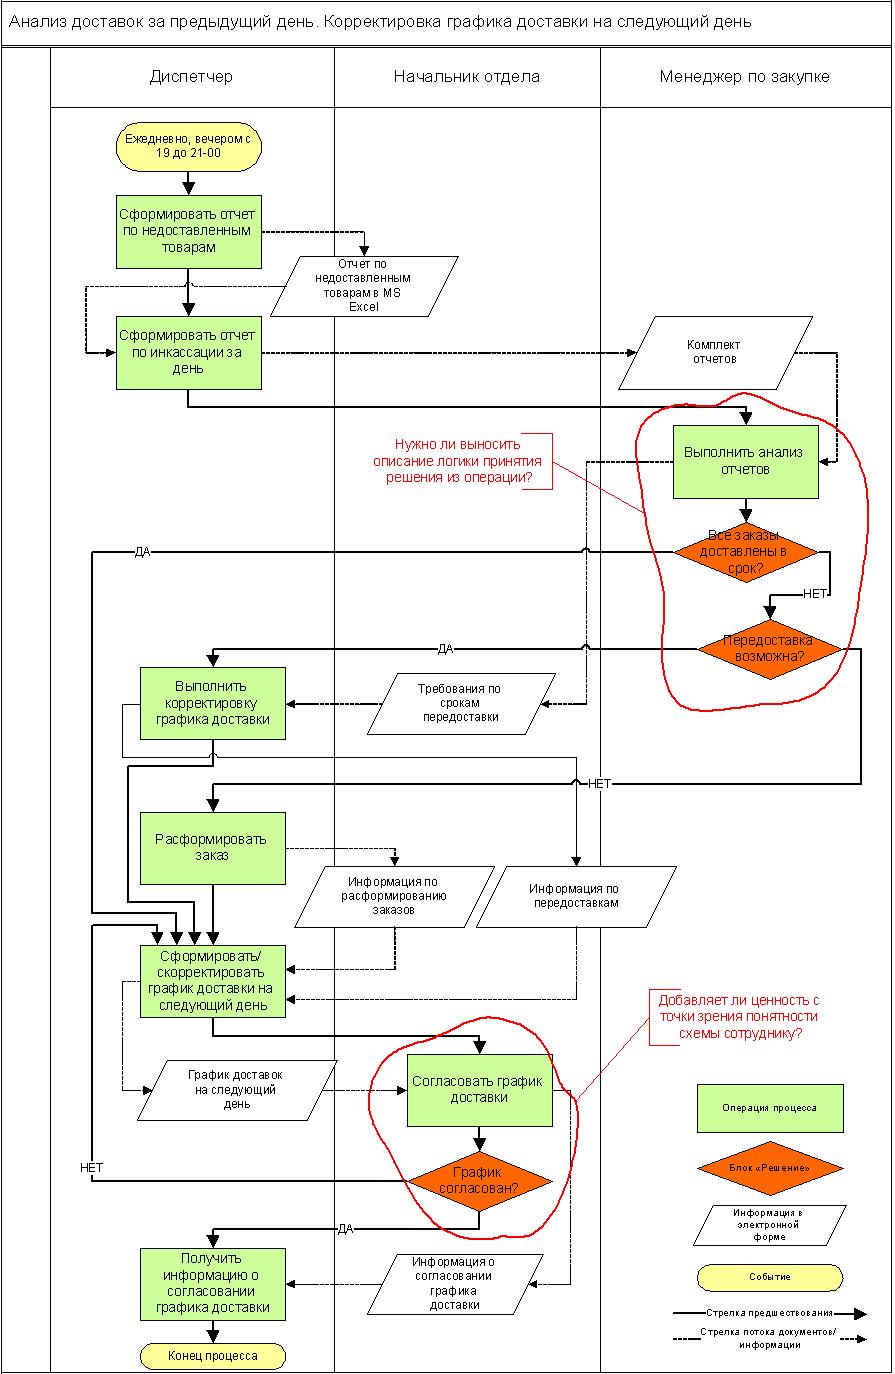 Бизнес операции схема